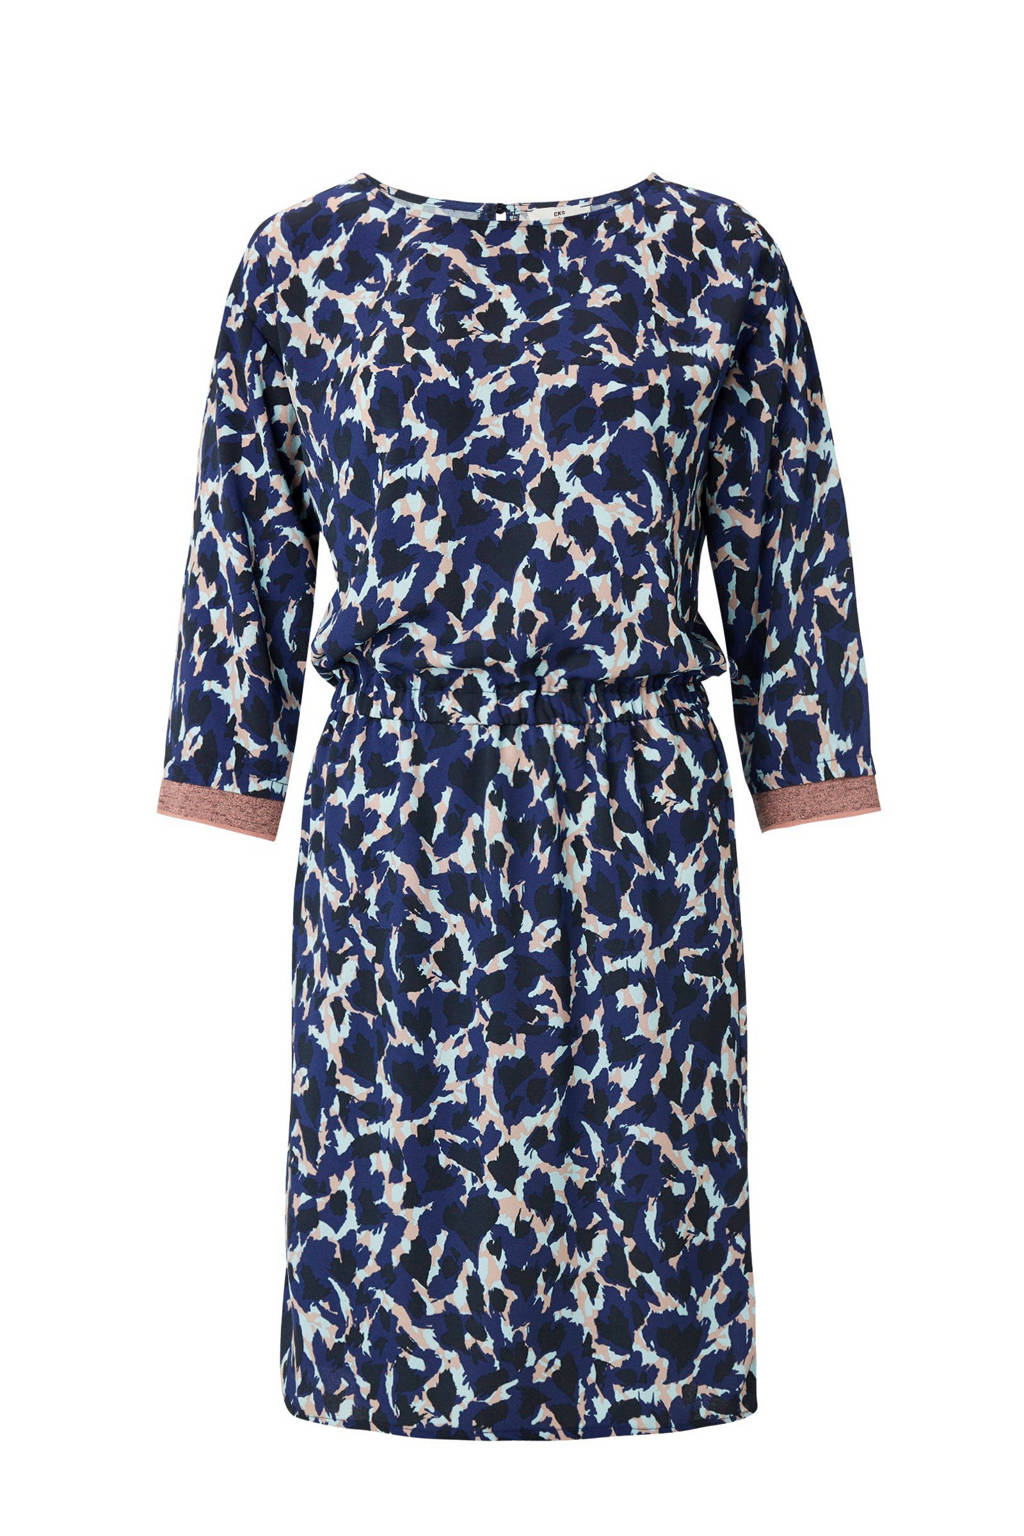 640baf13175 CKS jurk Marley met print blauw, Blauw/wit/roze